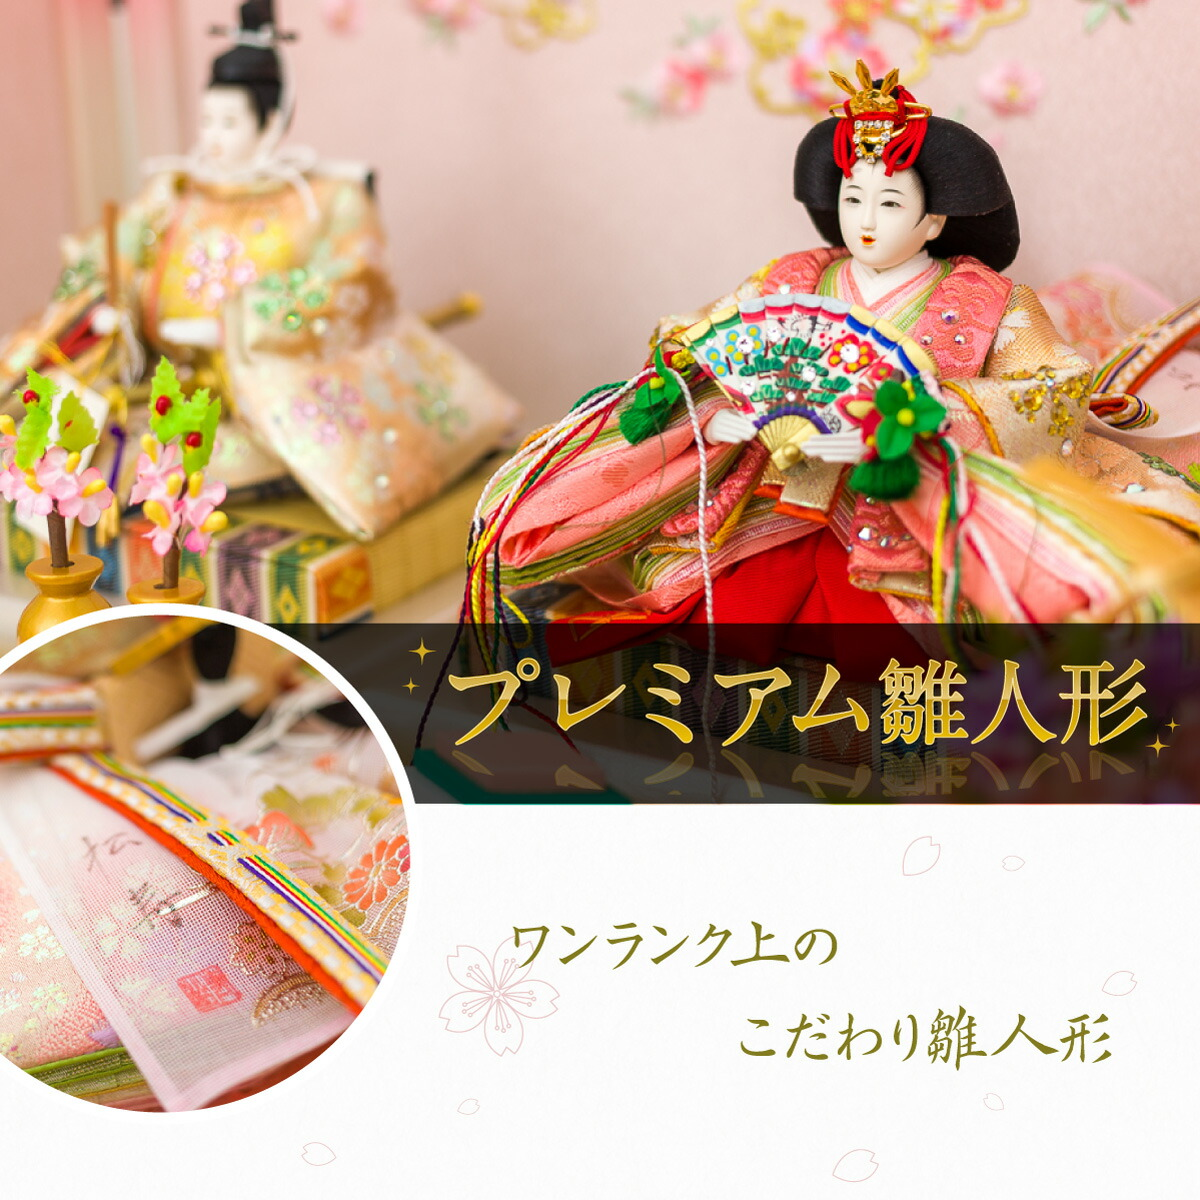 https://image.rakuten.co.jp/komari/cabinet/hina7e3/sh/sh228-a-01.jpg